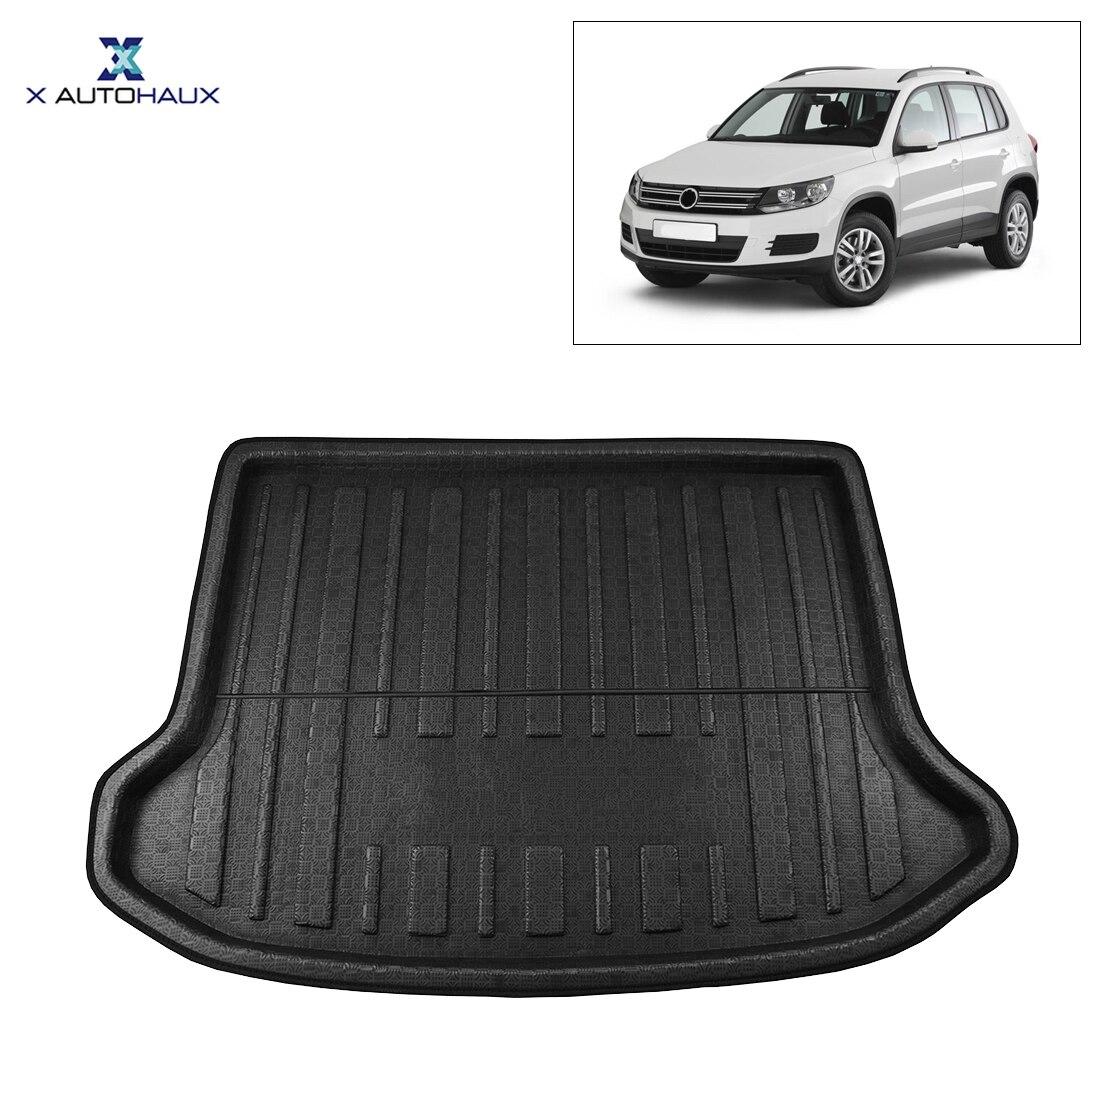 X AUTOHAUX Black Car Rear Trunk Floor Mat Cargo Boot Liner Carpet Tray For VW Tiguan 2012-2016 2013 2014 2015